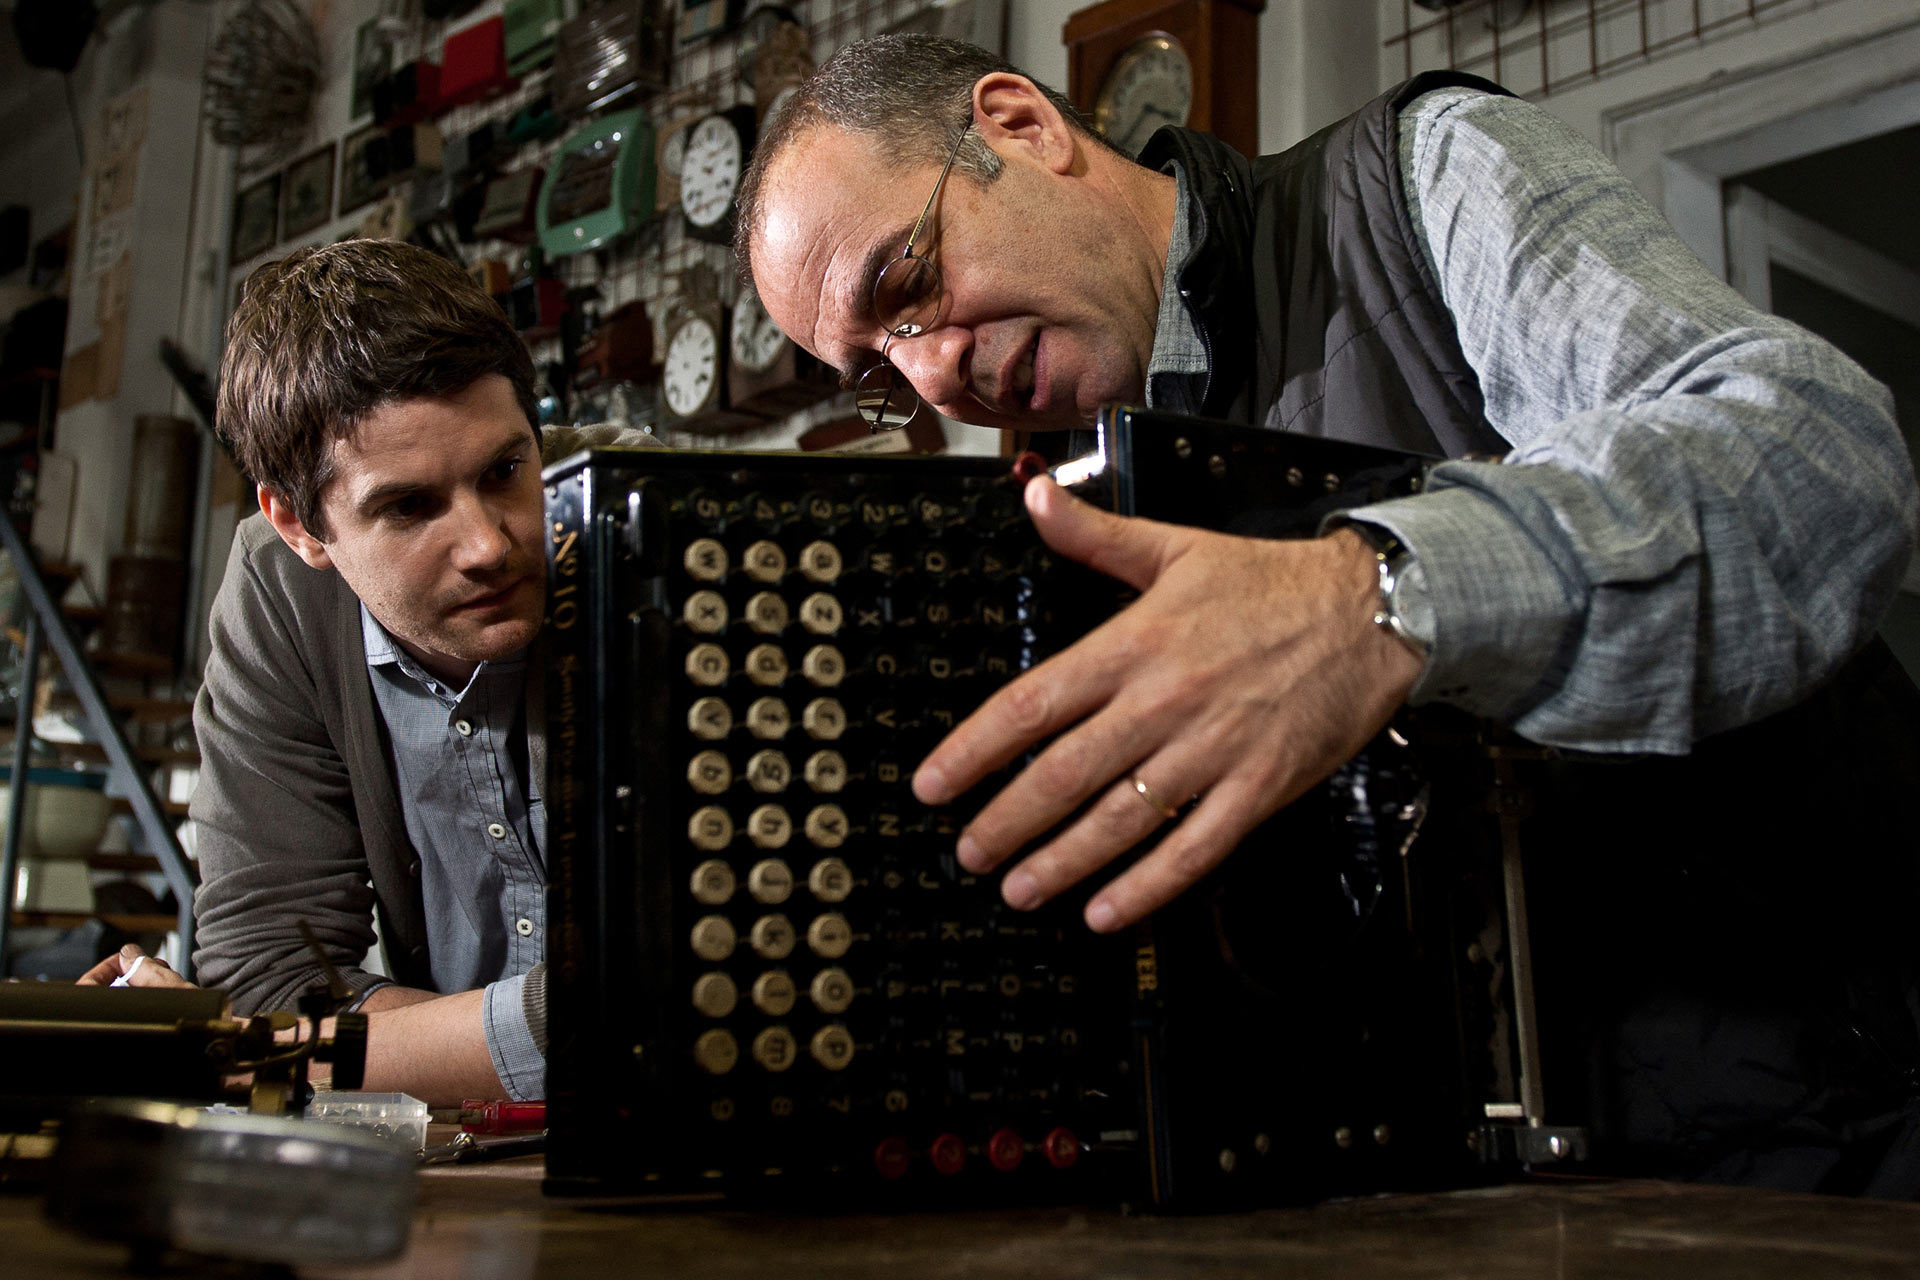 Jim Sturgess and Giuseppe Tornatore in La migliore offerta (2013)